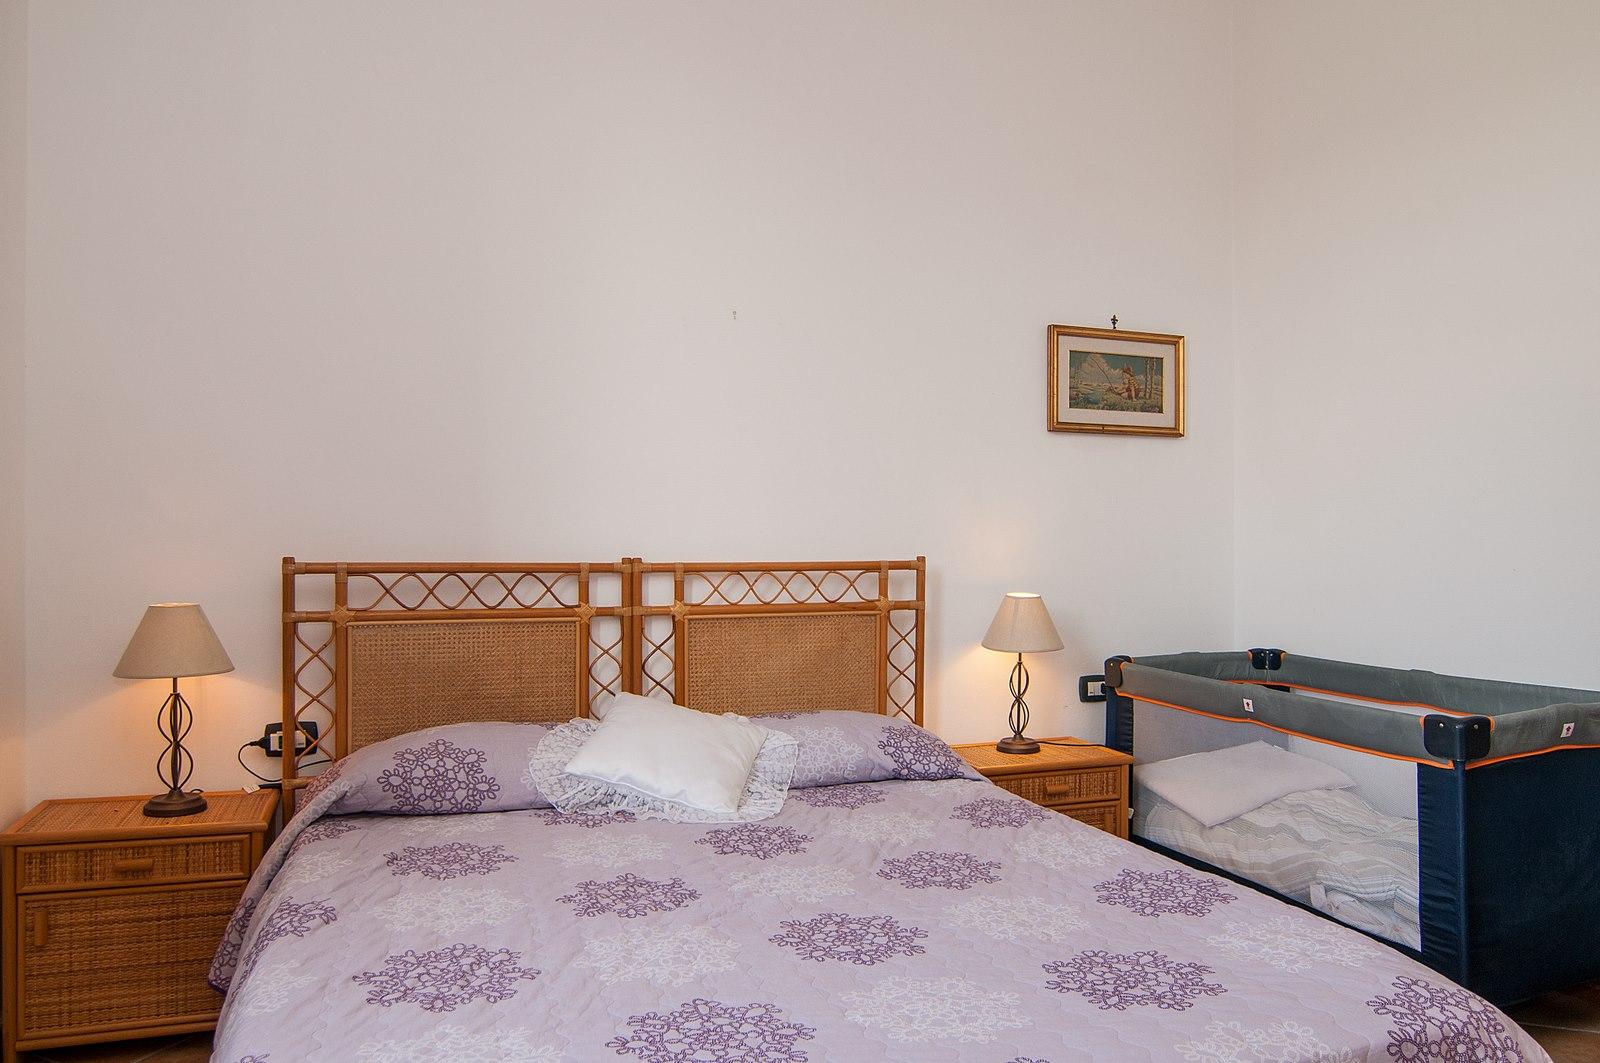 Maison de vacances Villetta a Lido (1540086), Lido di Noto, Siracusa, Sicile, Italie, image 22